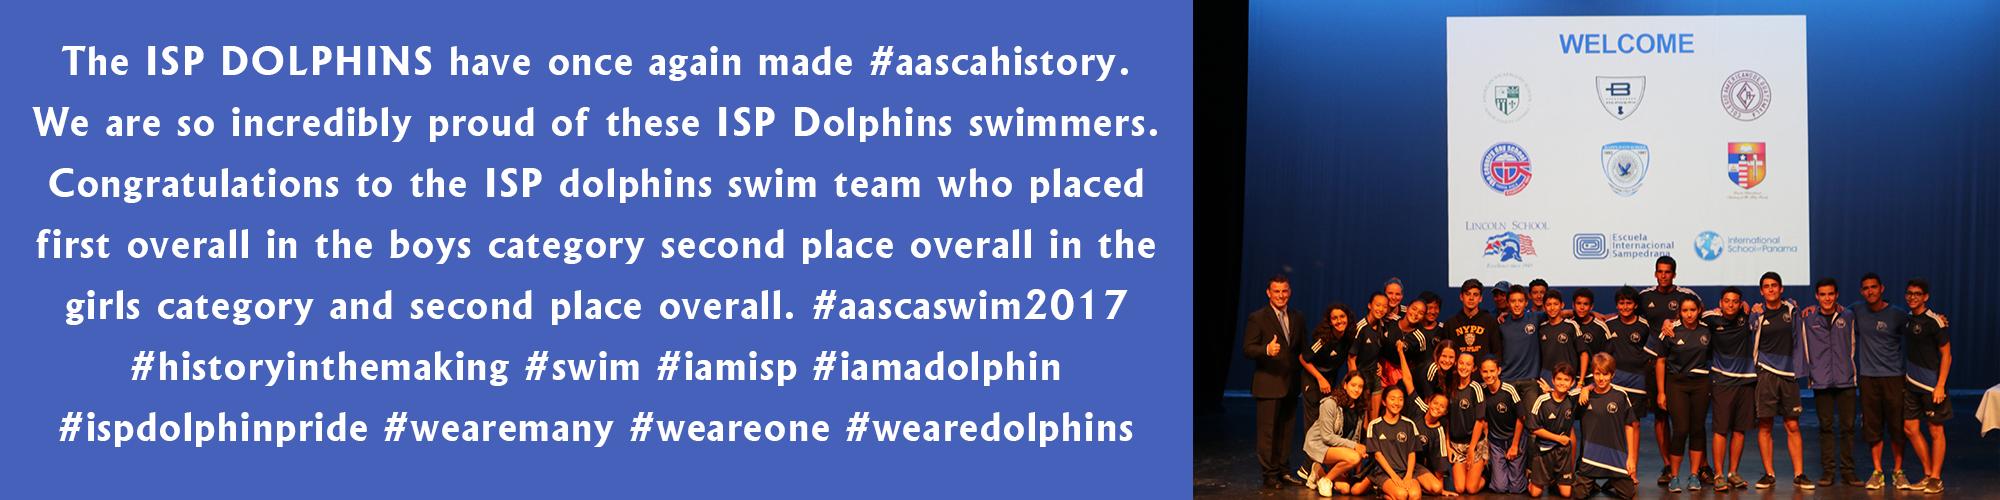 2017 Swim Invitational March 16-19, 2017 - AASCA Swimming Panama, International School of Panama